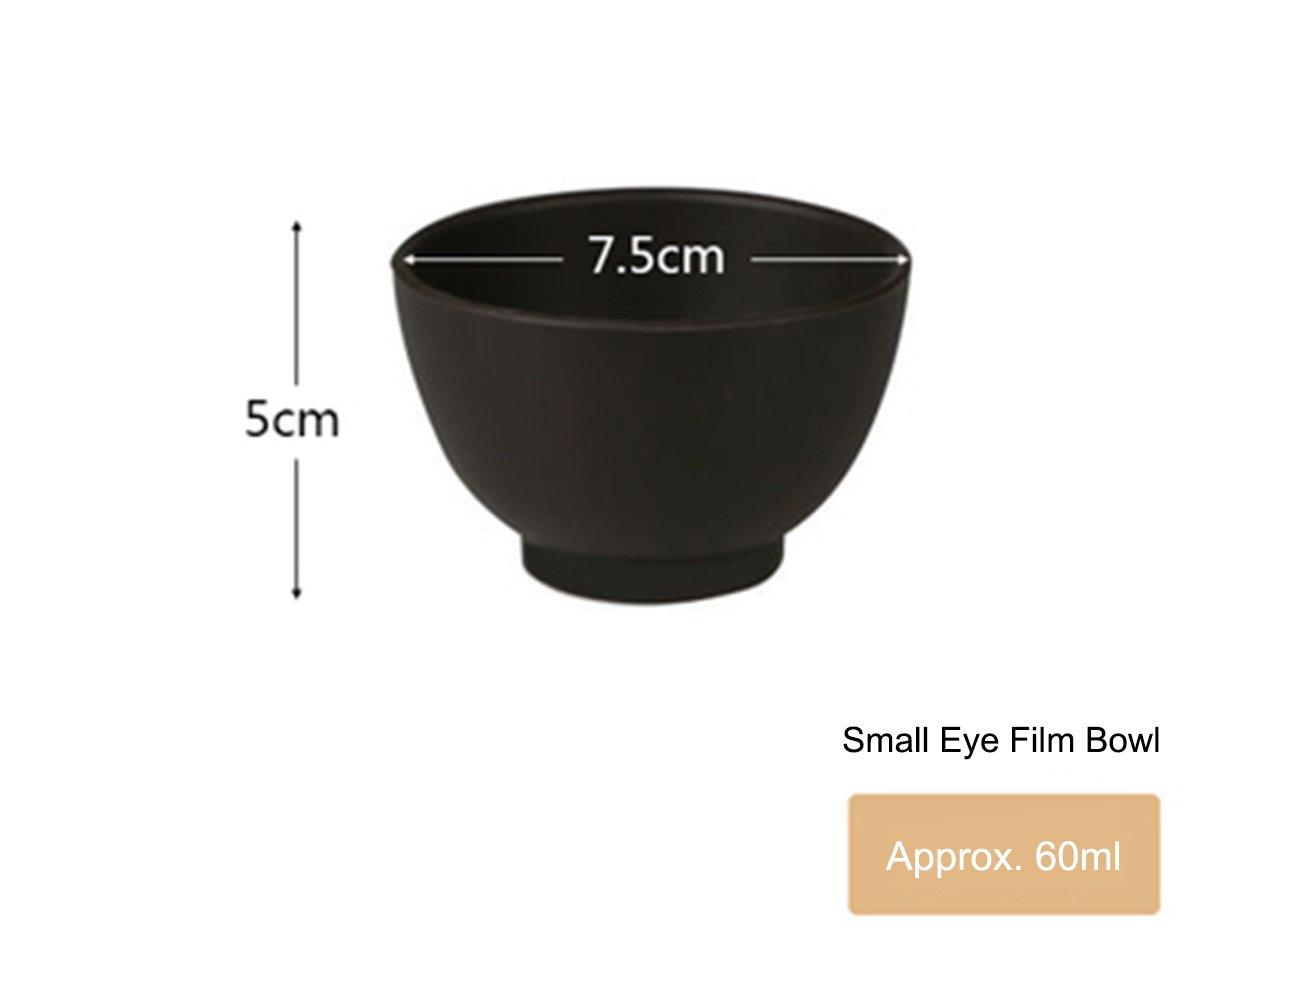 Elitzia ETBWP001B Mask Tools Silicone Adjust Film Mask Bowl Beauty Salon Powder Necessary Supplies Brown Color 4 Size Options (7.5×5)